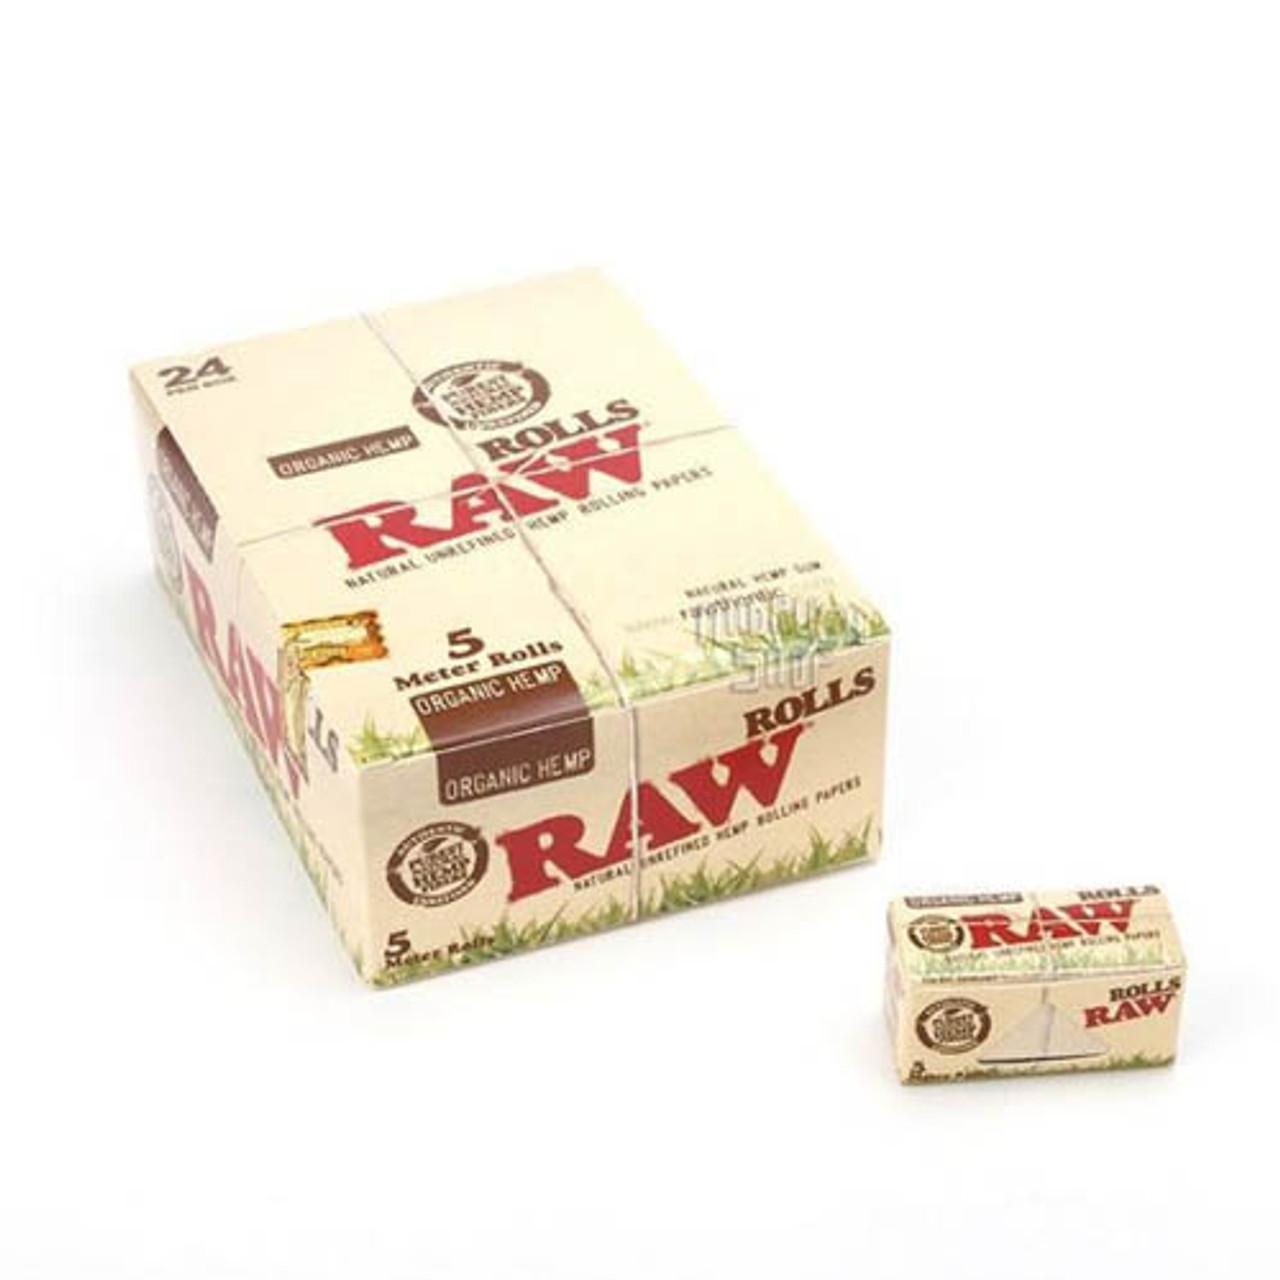 RAW Organic Hemp Rolls King Size Rolling Paper 5 Meter Roll (Display of 24)